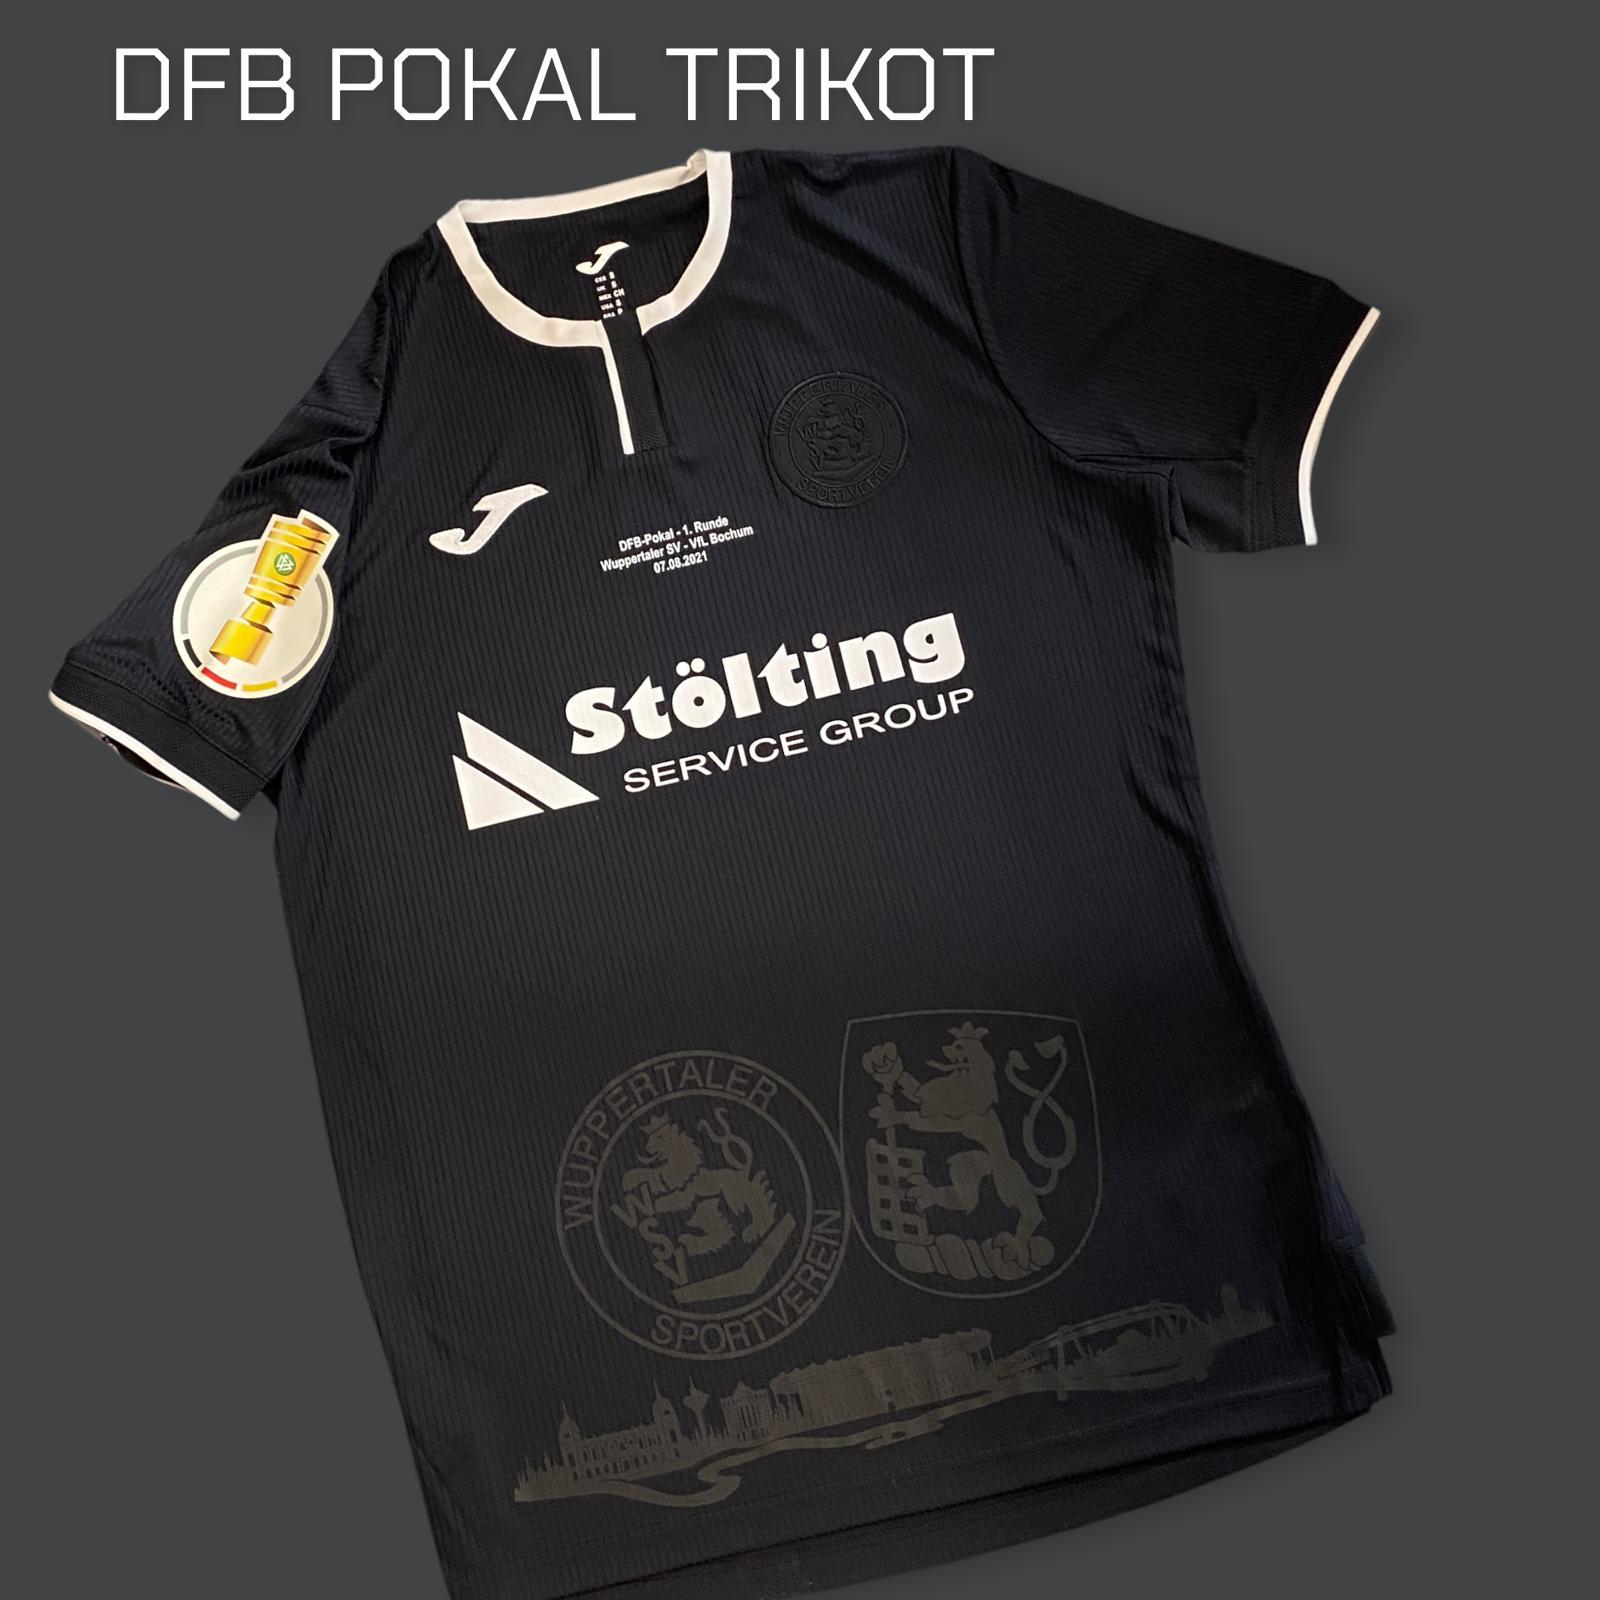 DFB-Pokaltrikot 2021/2022